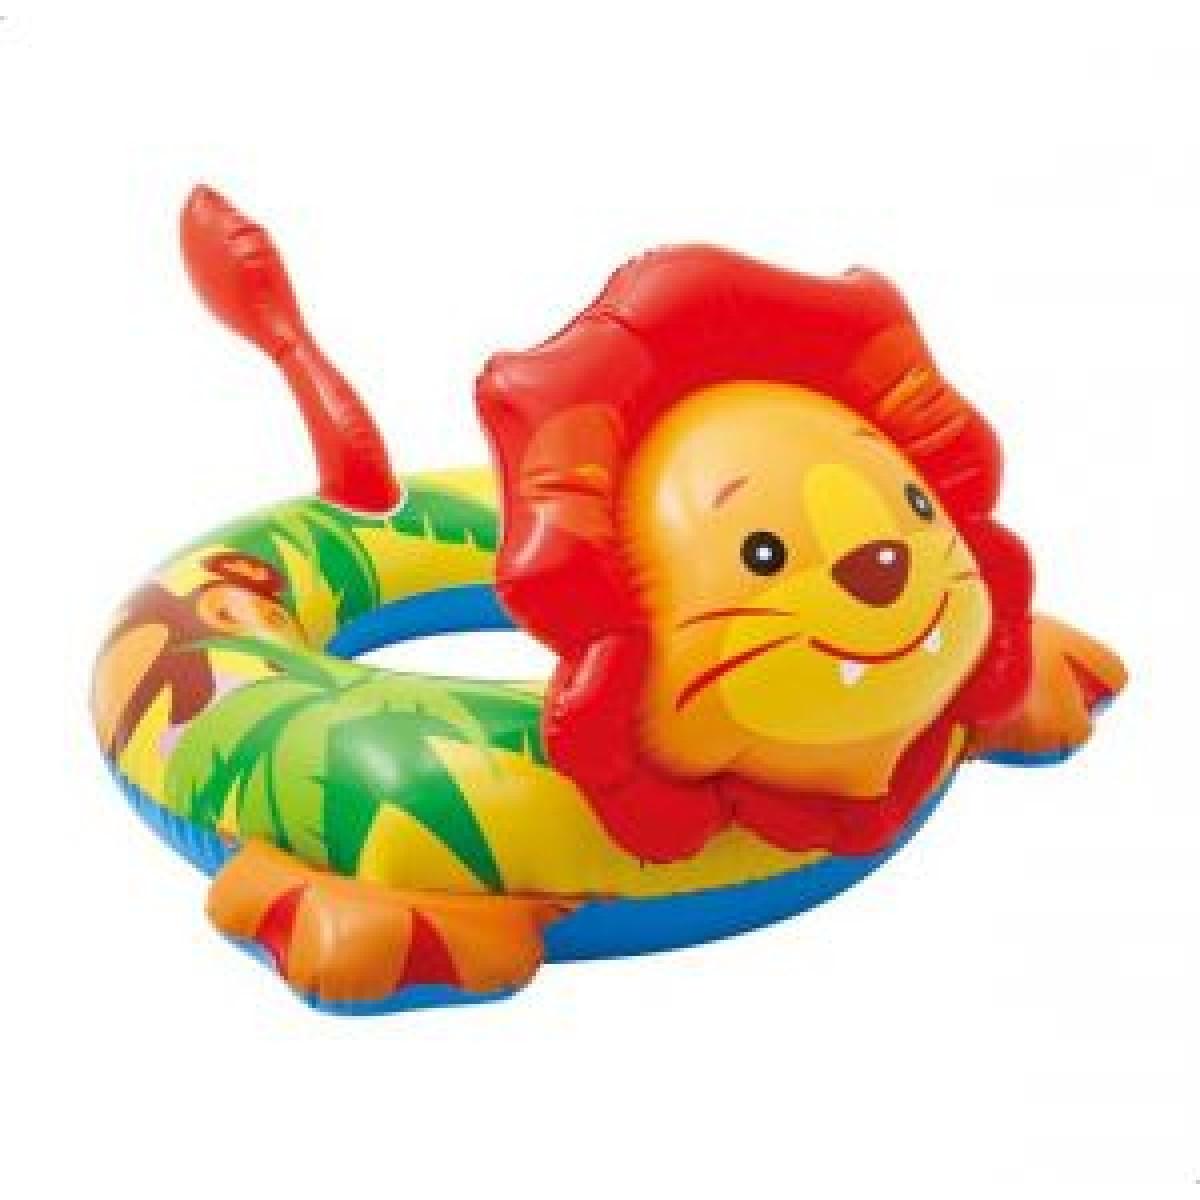 كفر سباحة دائري ملون للاطفال شكل اسد موديل 589221NP